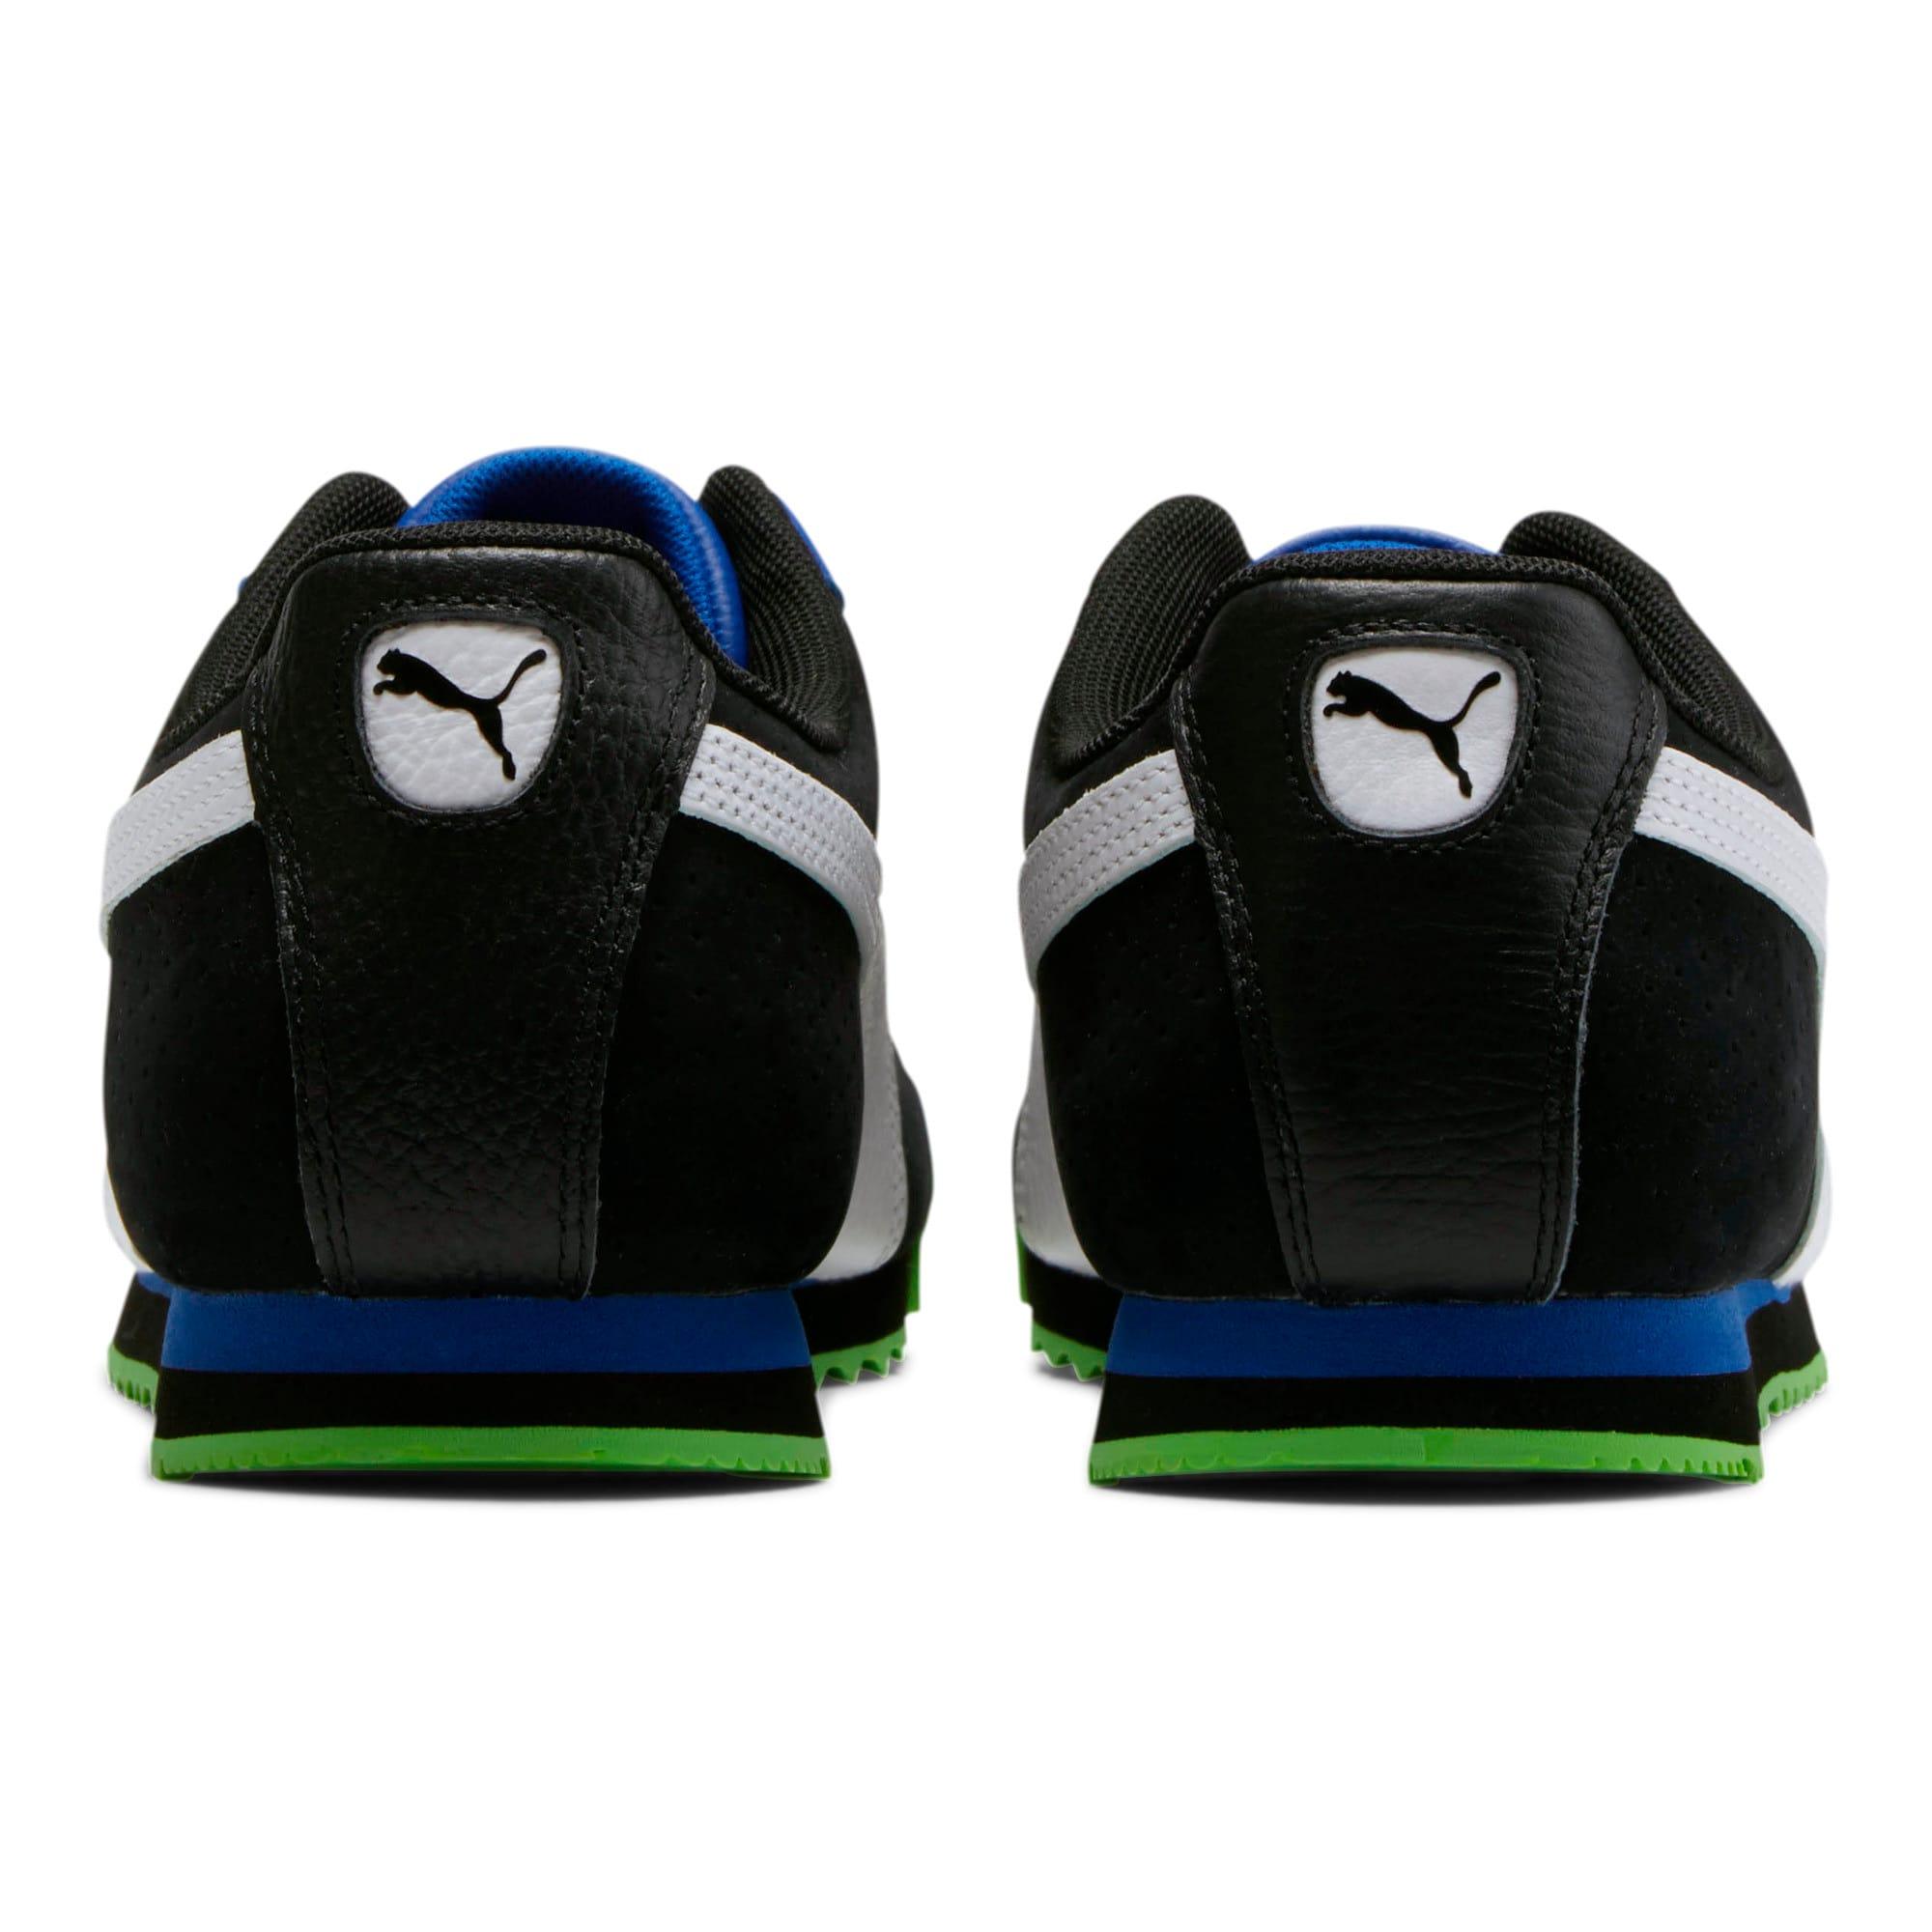 Thumbnail 3 of Roma XTG Perf Men's Sneakers, Puma Black-Surf The Web, medium